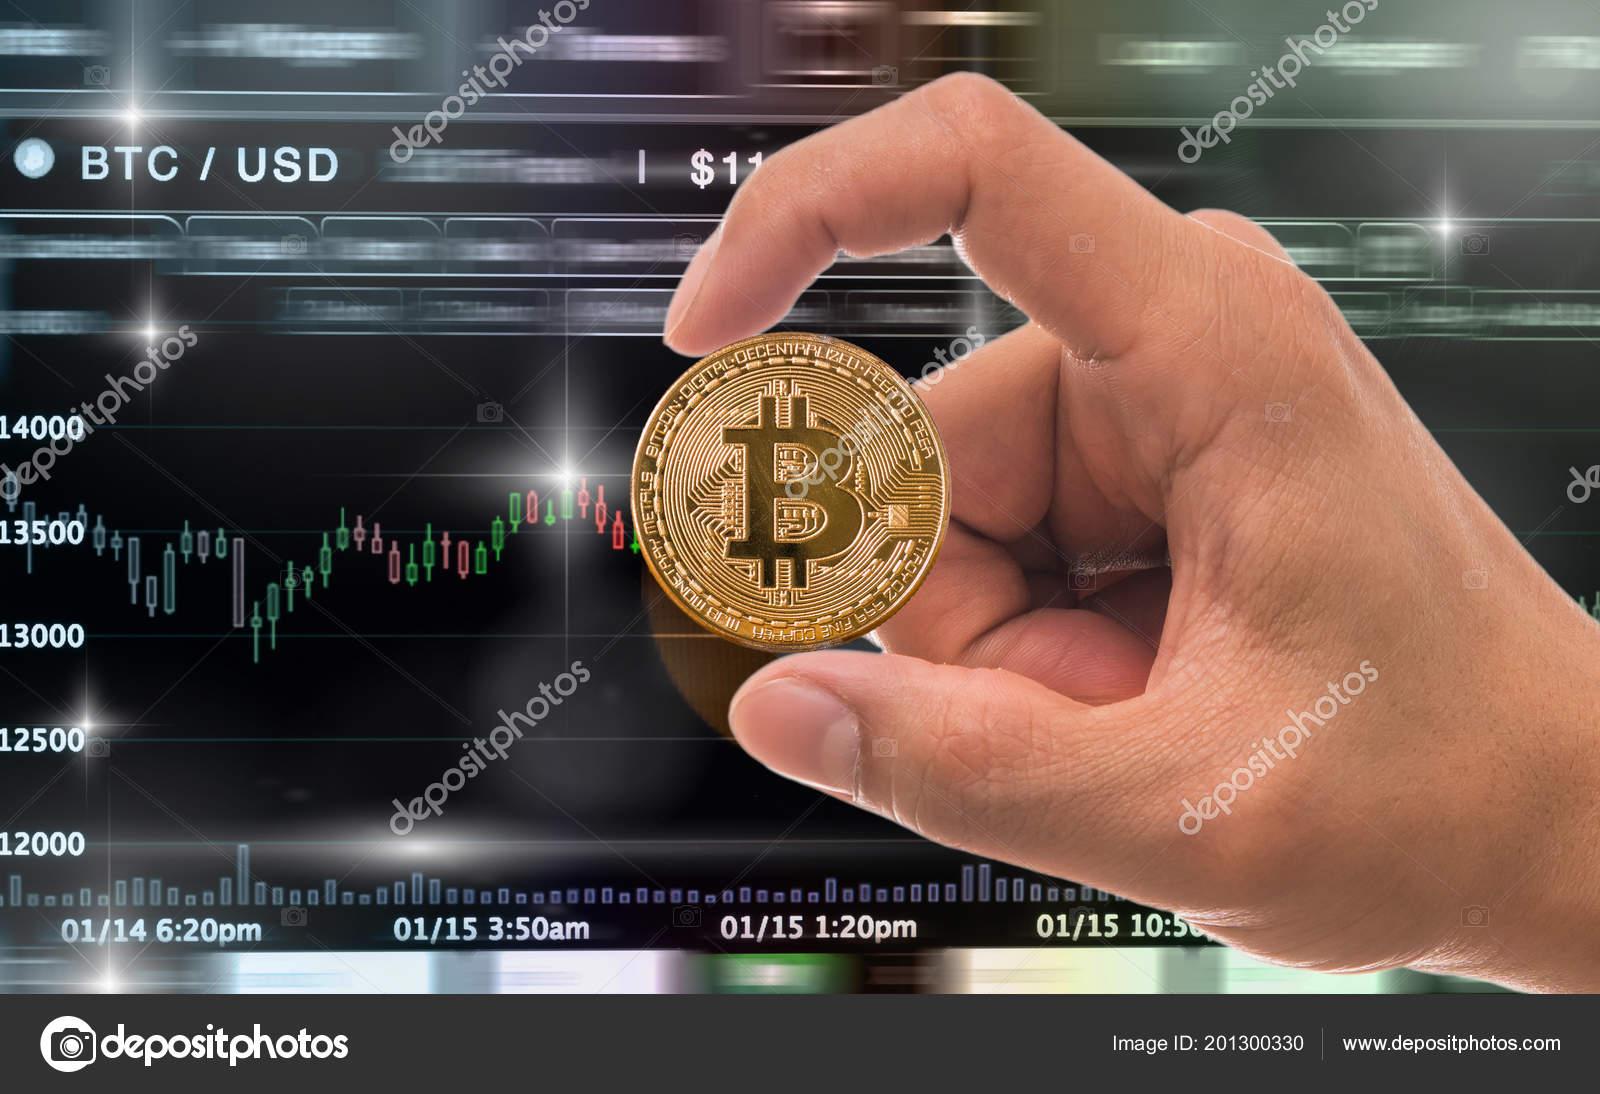 0 0075 btc usd bitcoin rate pkr